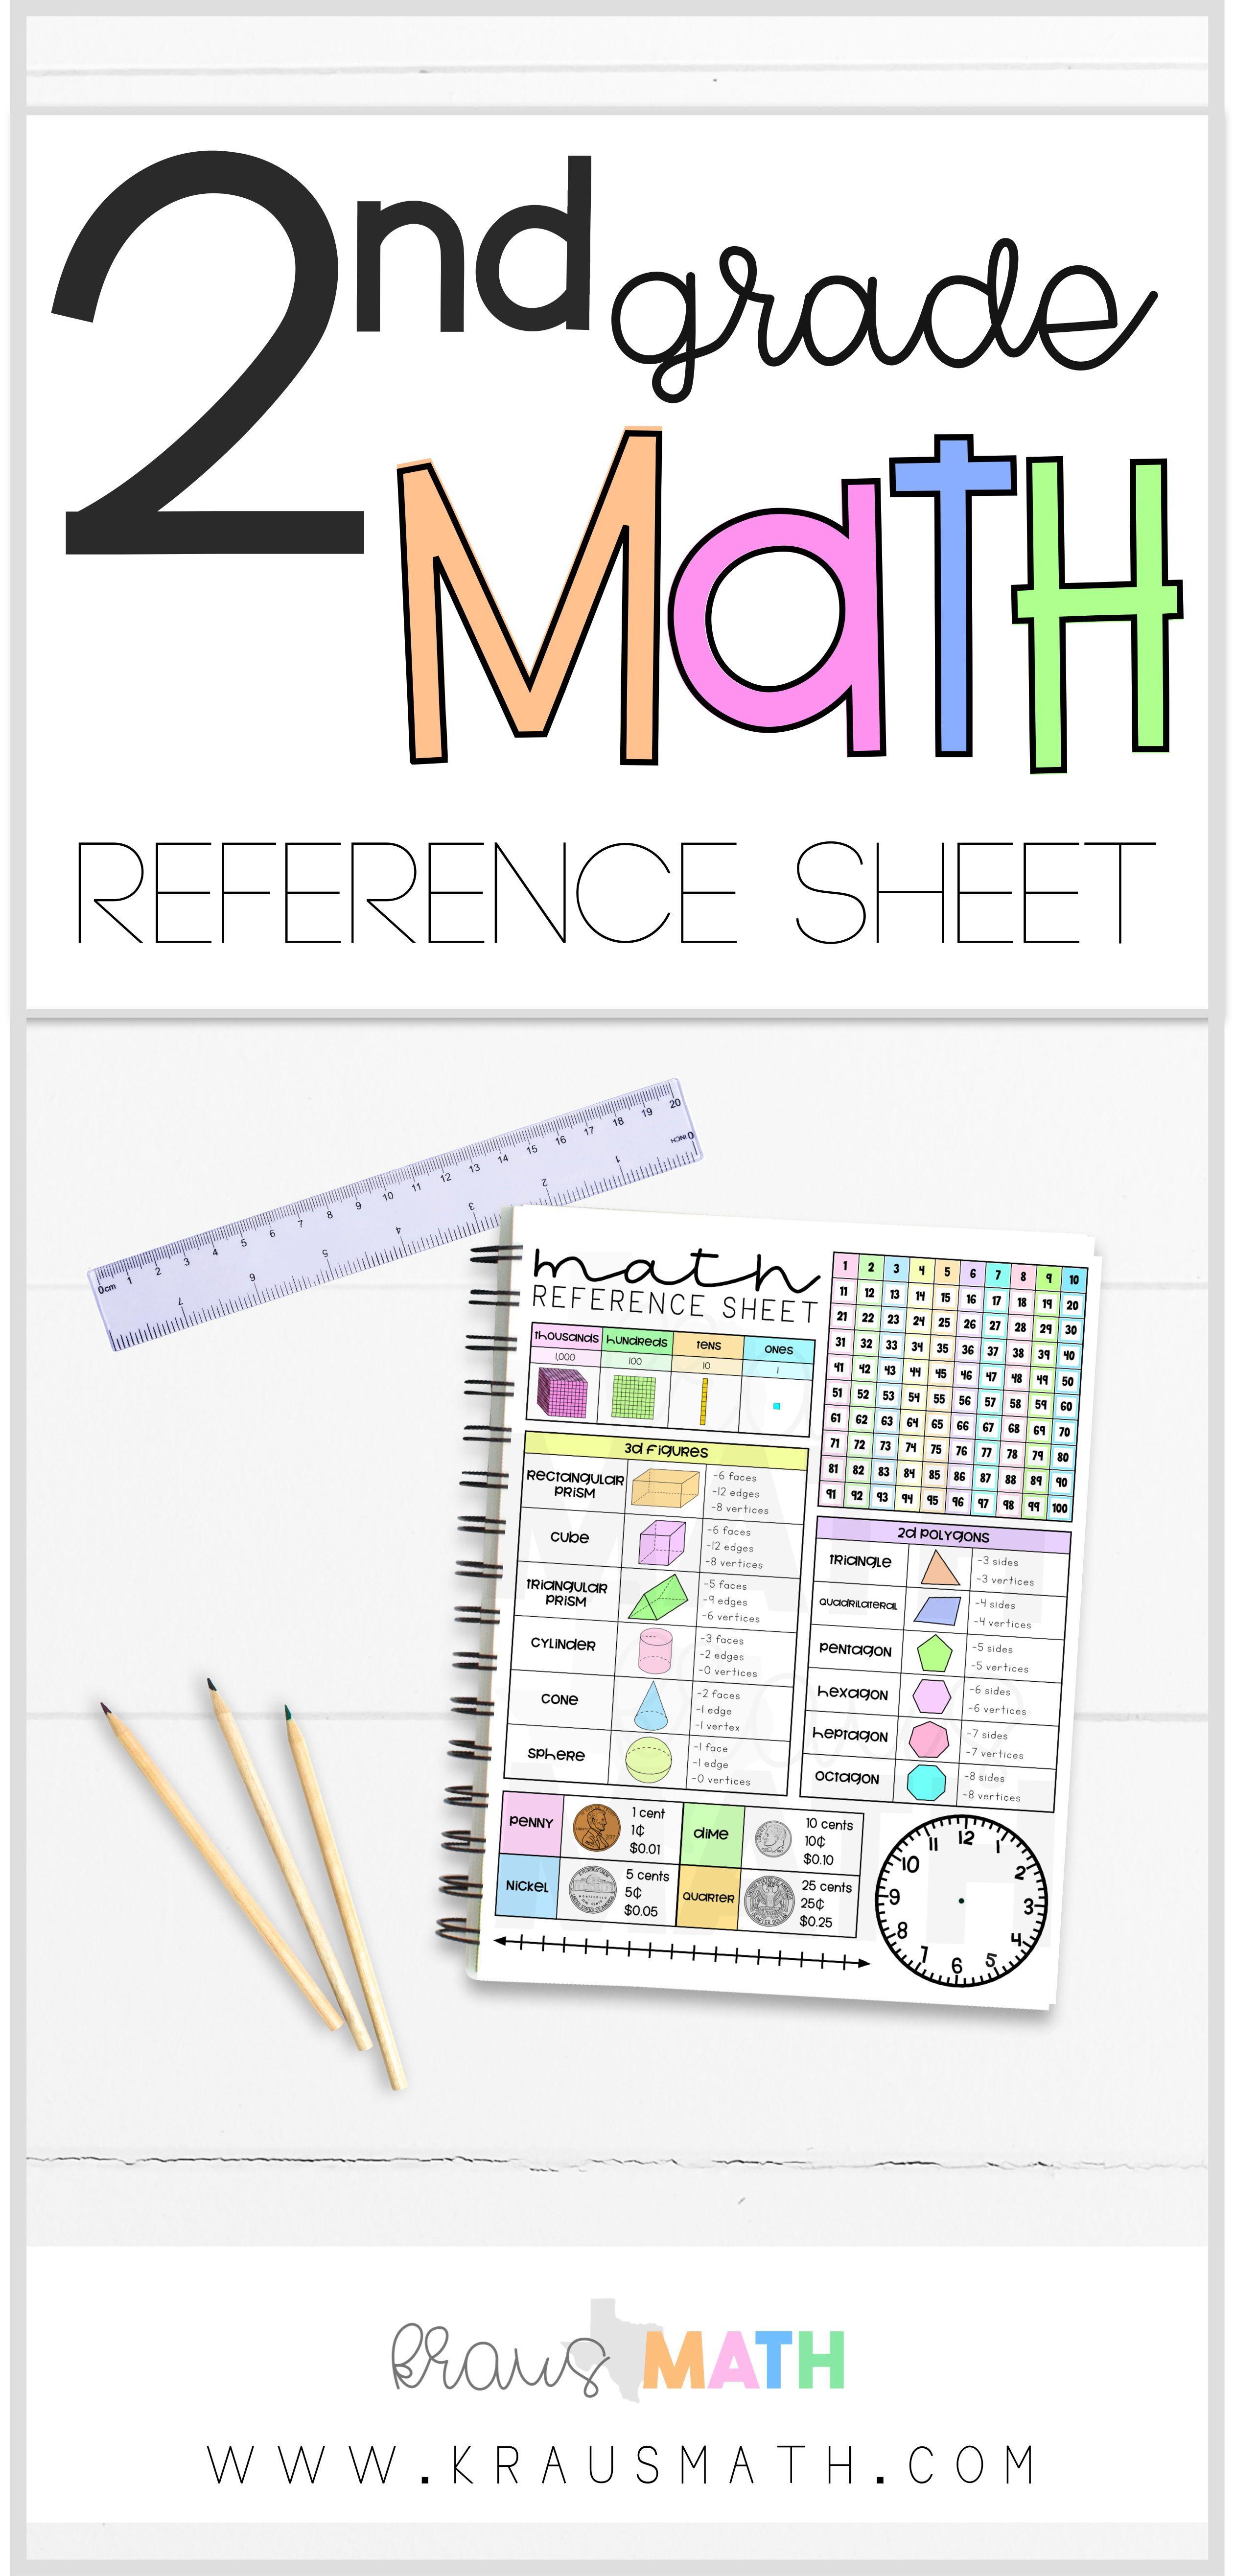 2nd Grade Math Reference Sheet   Kraus Math   Math reference sheet [ 5263 x 2523 Pixel ]